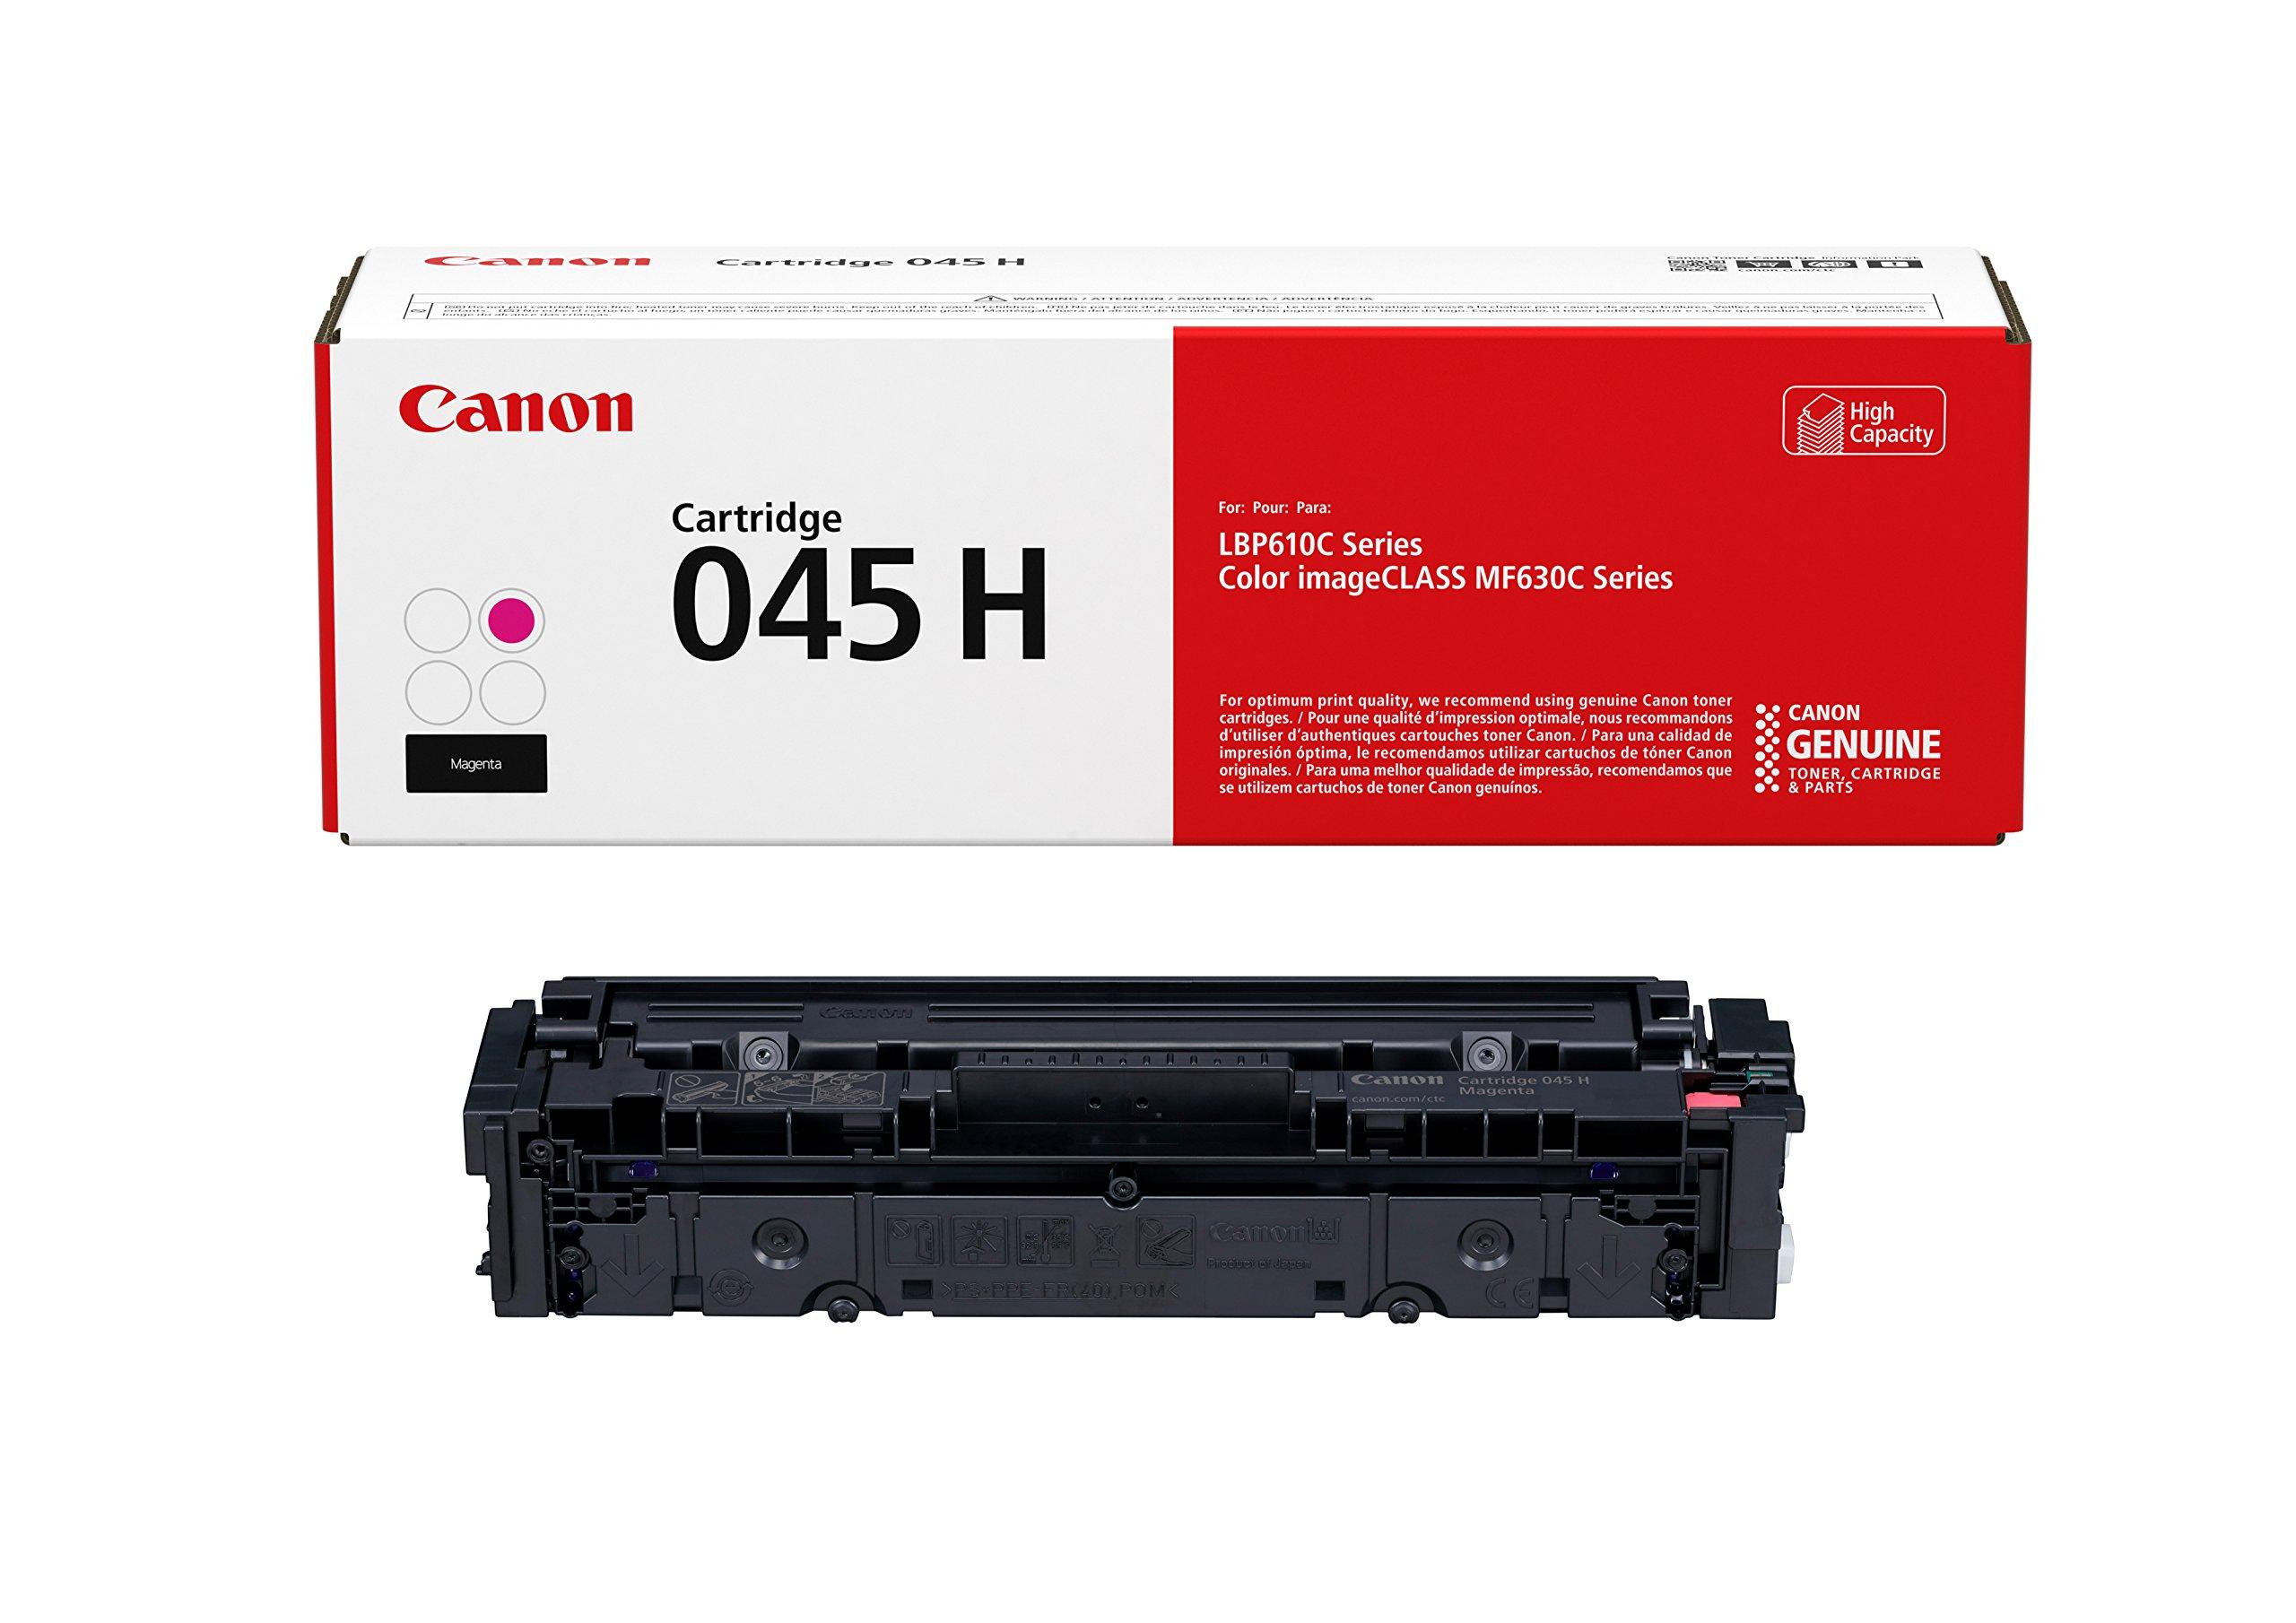 Canon Genuine Toner, Cartridge 045 Magenta, High Capacity (1244C001), 1 Pack, for Canon Color imageCLASS MF634Cdw, MF632Cdw, LBP612Cdw Laser Printers